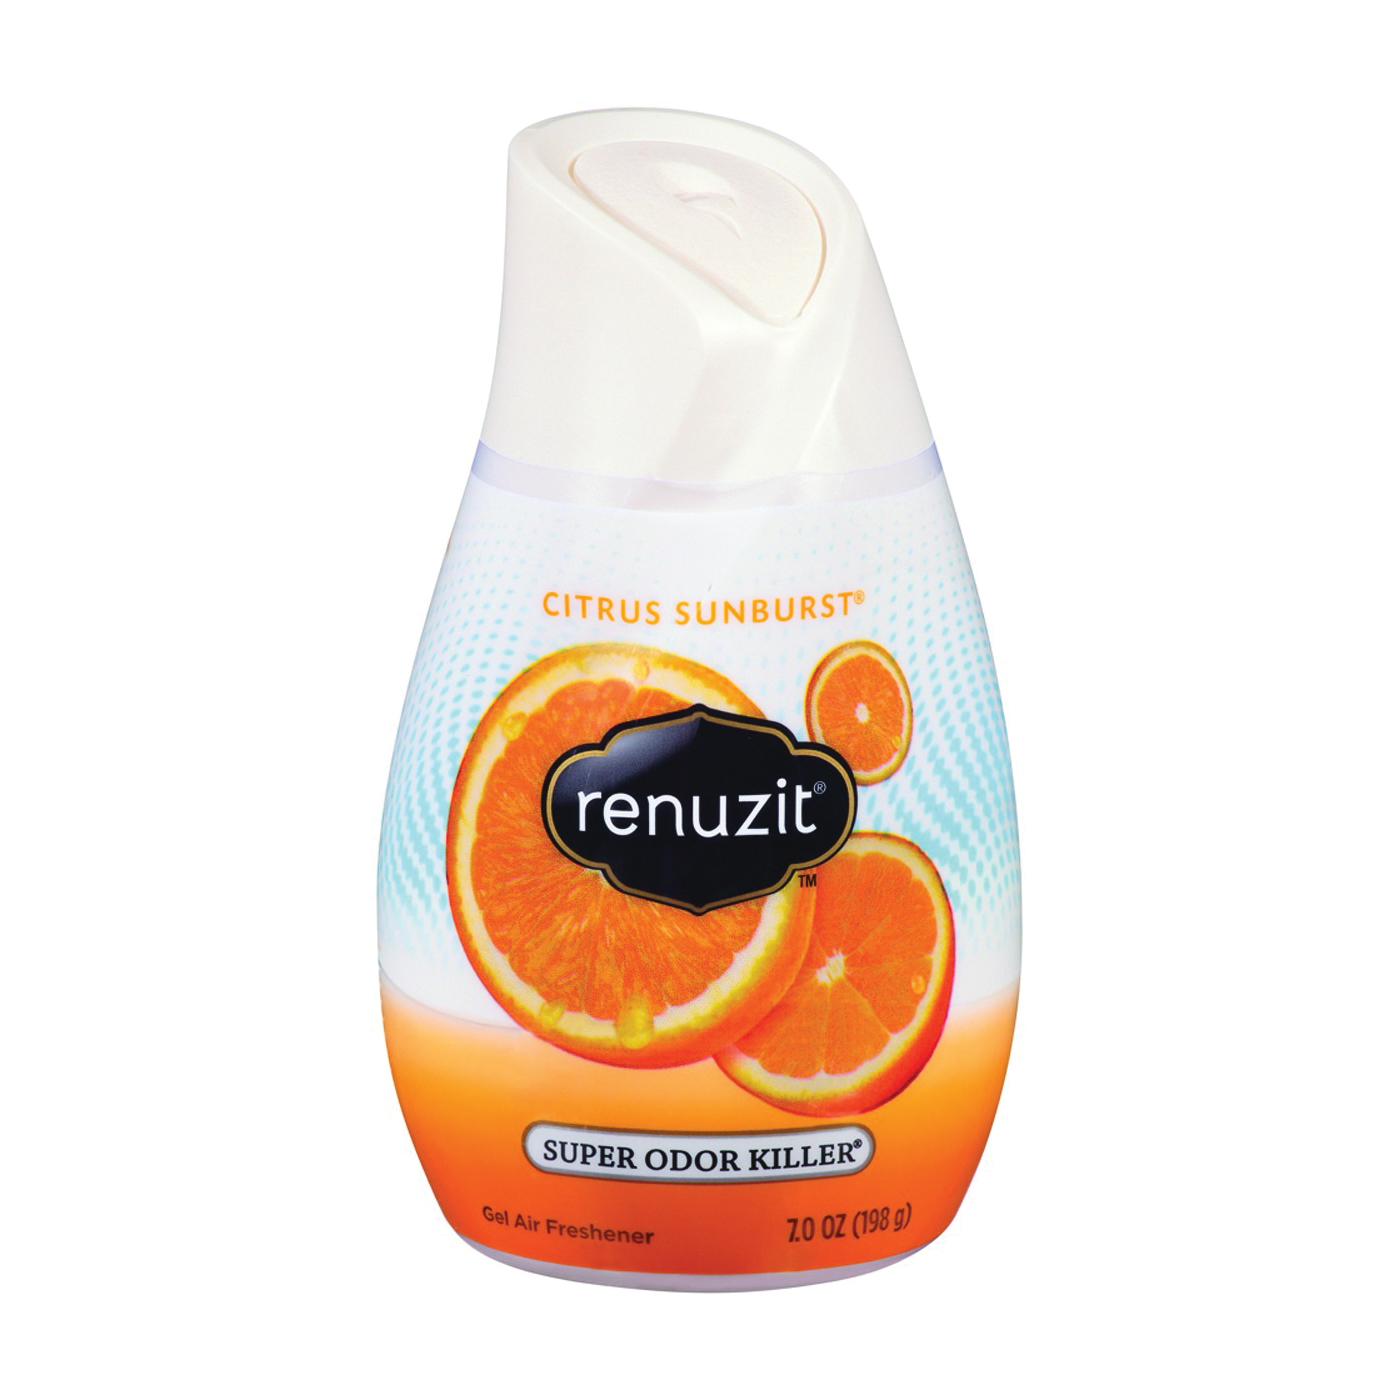 Picture of Renuzit 35000 Air Freshener Clear, 7.5 oz Package, Citrus Sunburst, Clear